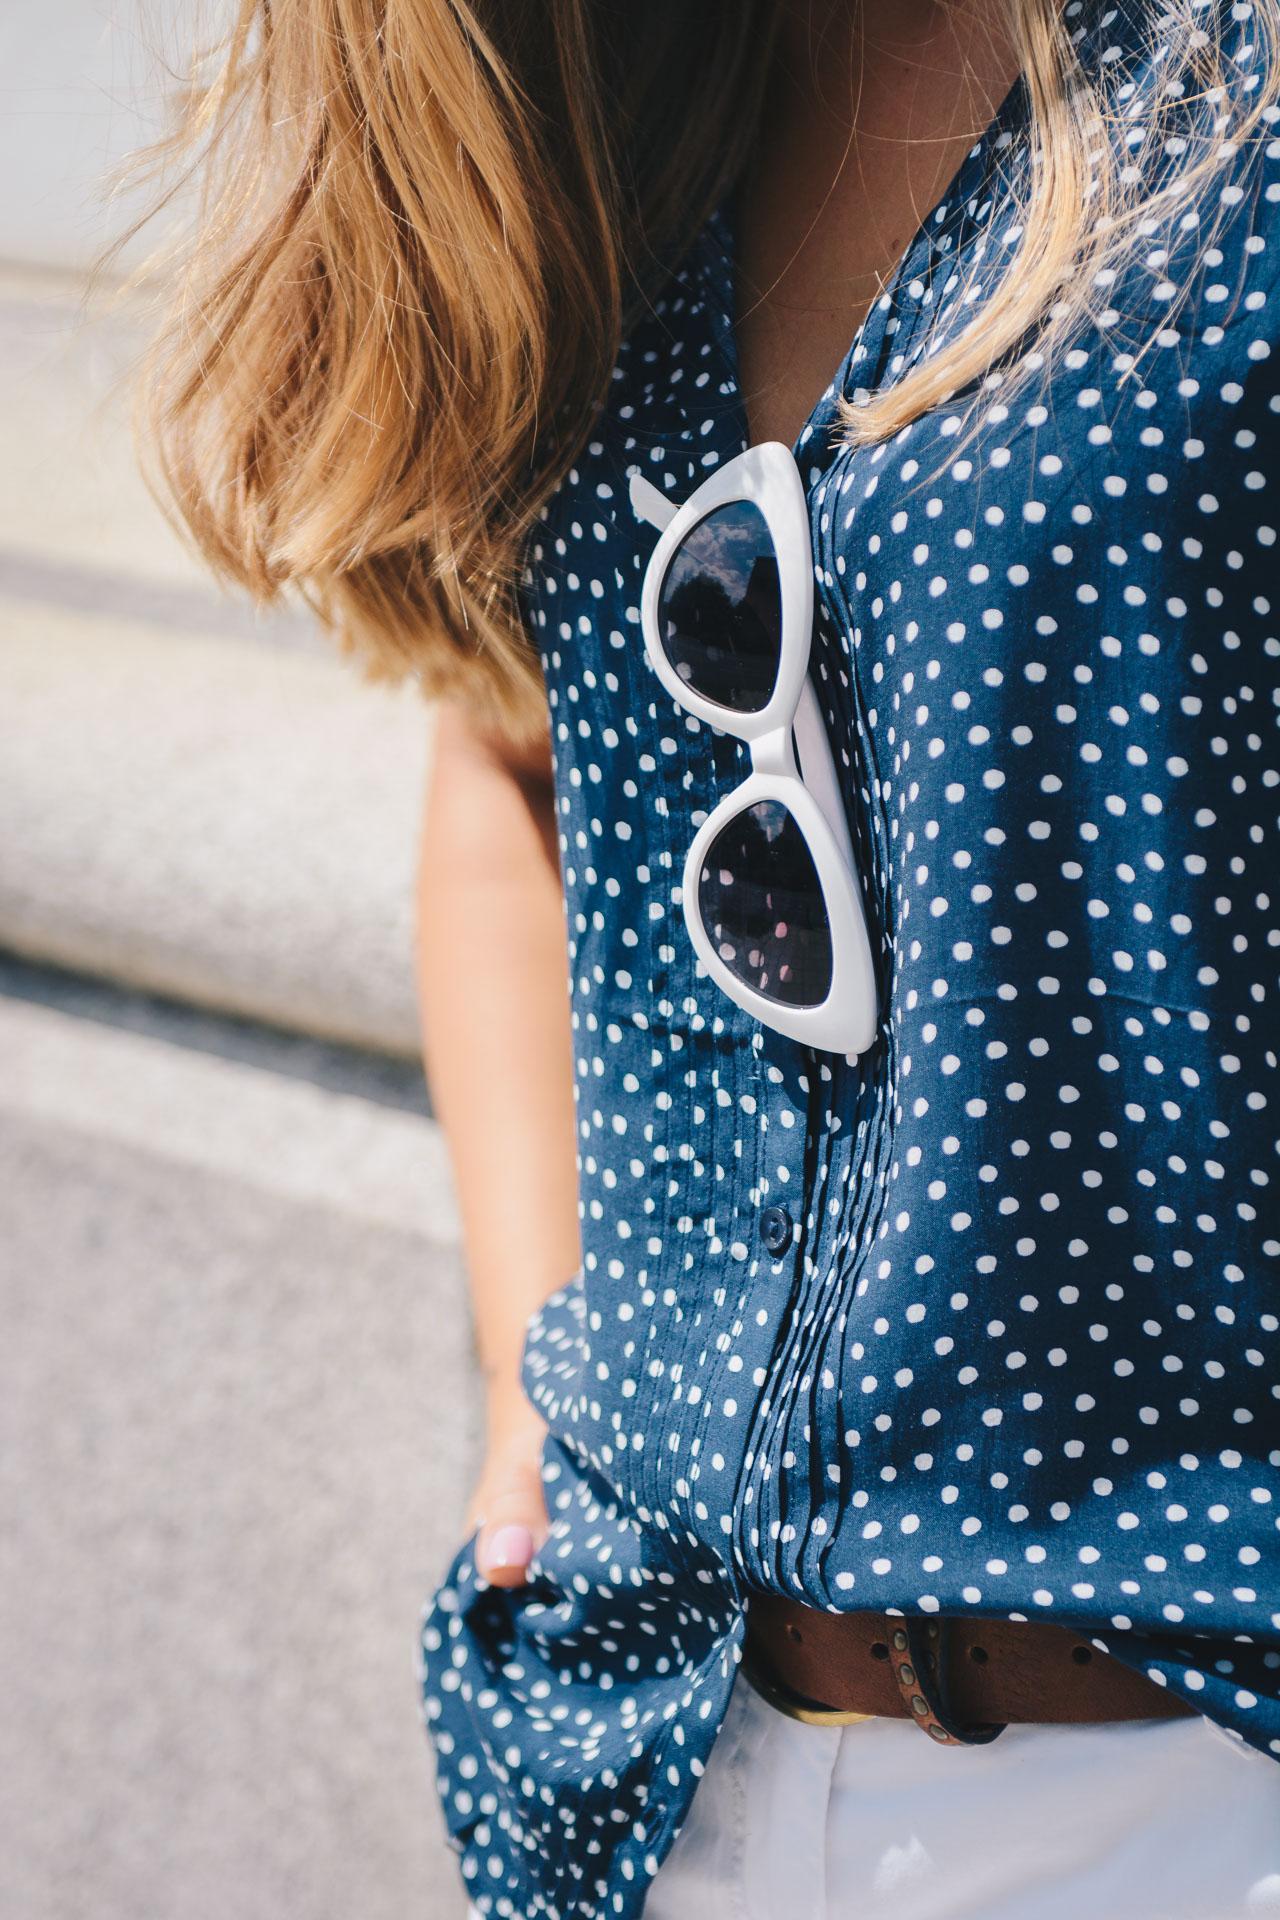 Retro white sunglasses